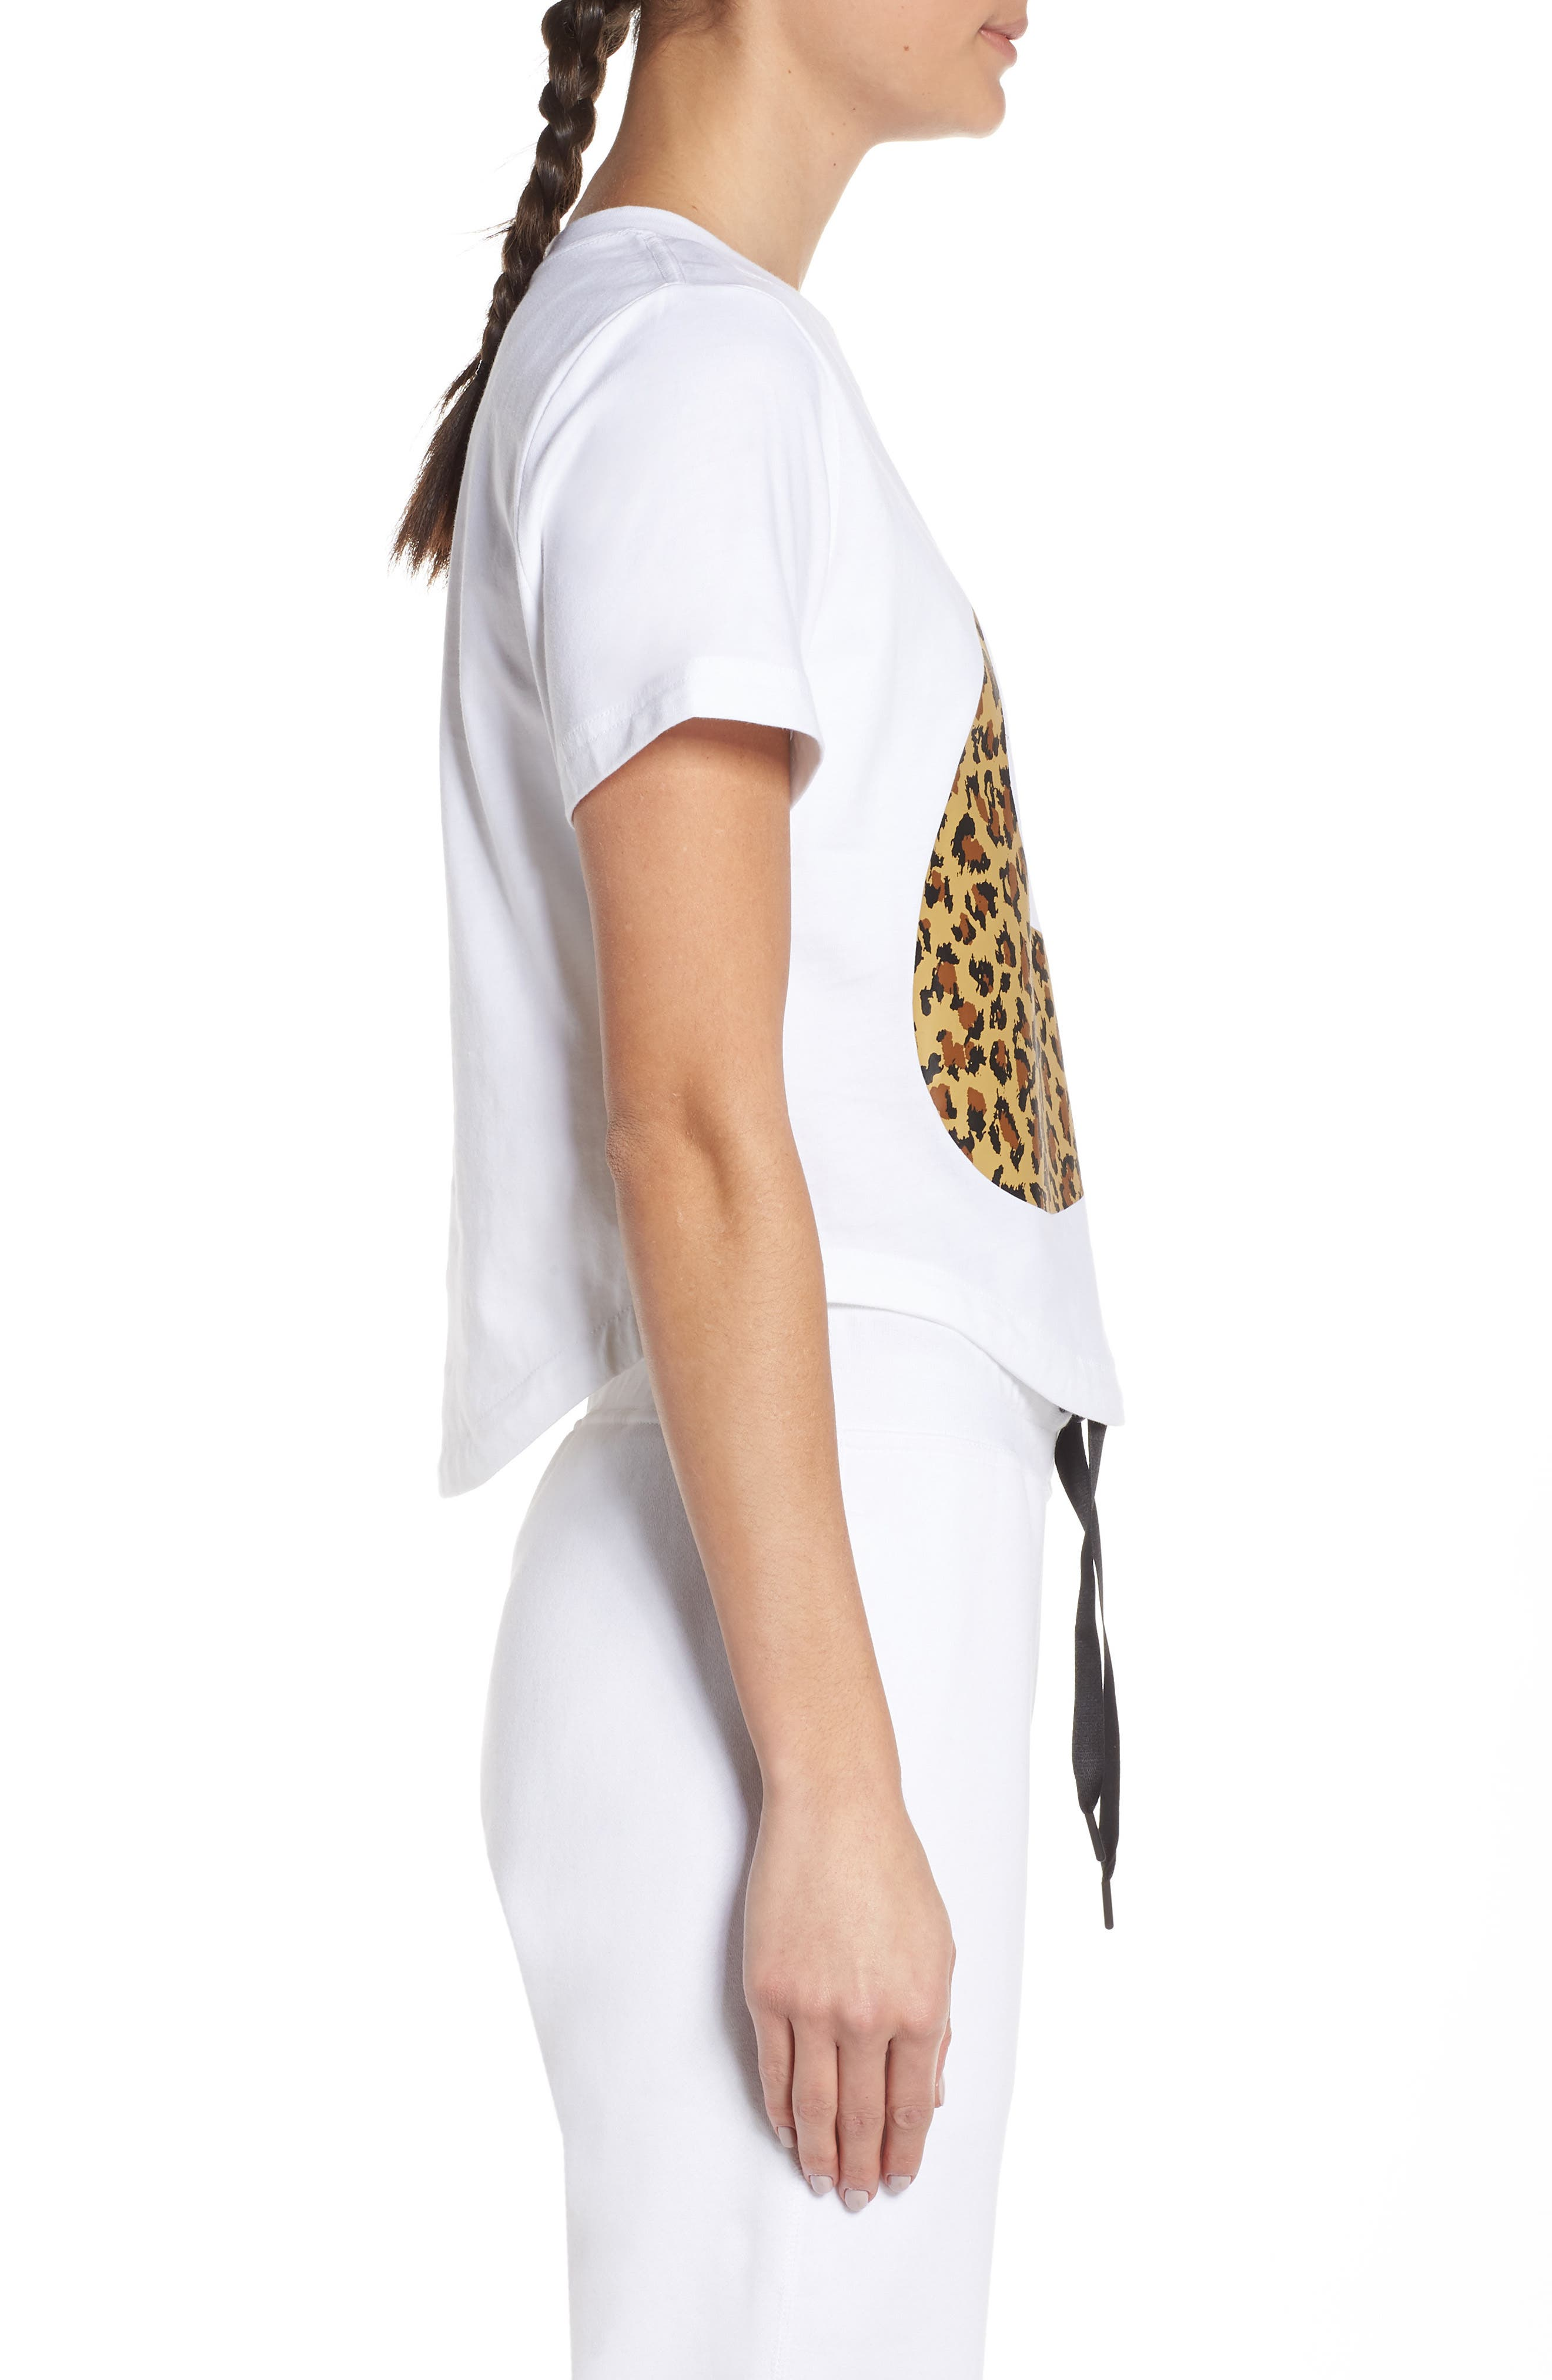 NIKE, Sportswear Women's Crop Top, Alternate thumbnail 4, color, WHITE